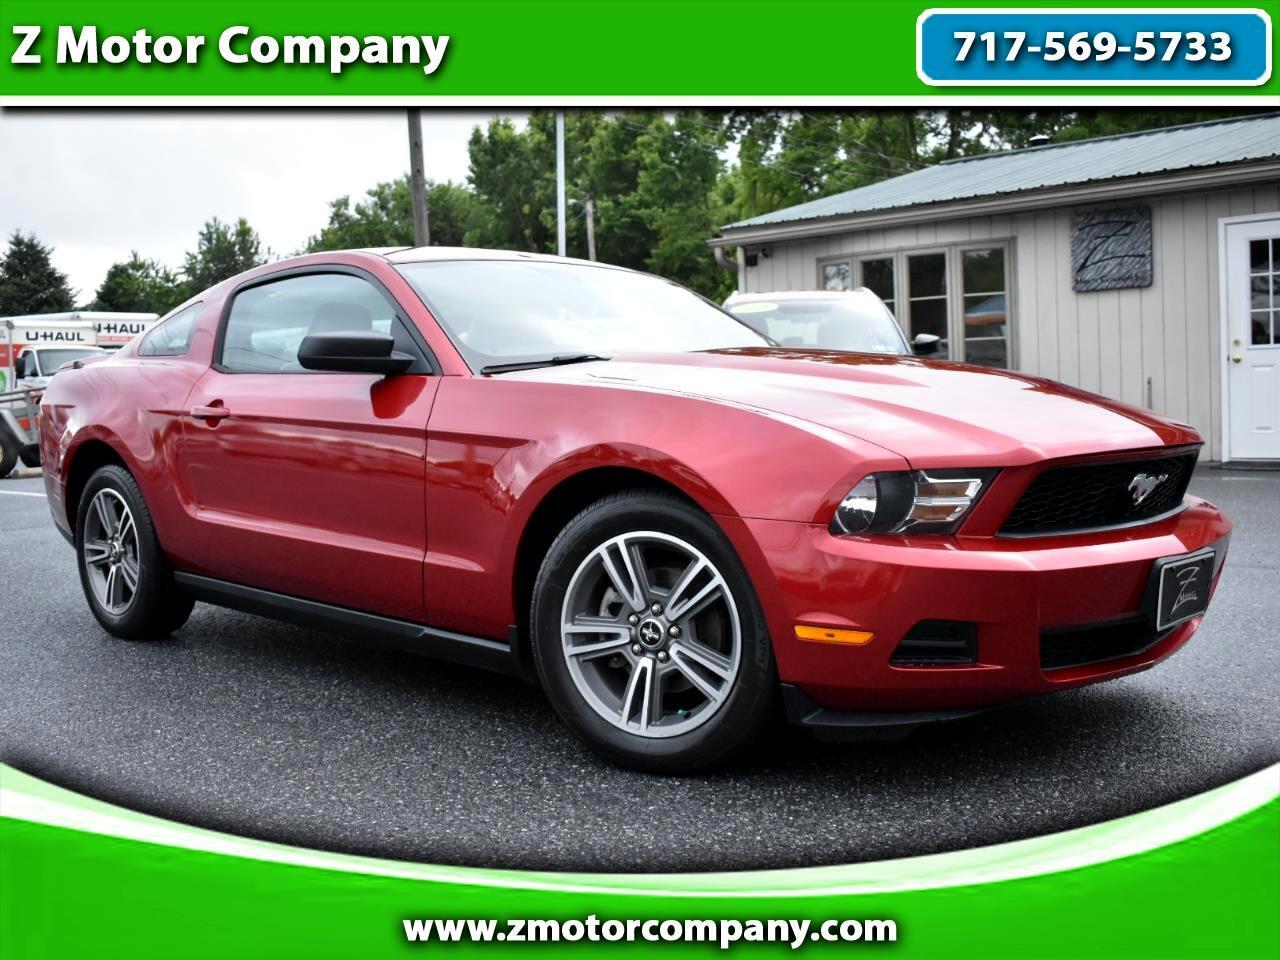 2010 Ford Mustang 2dr Cpe V6 Premium